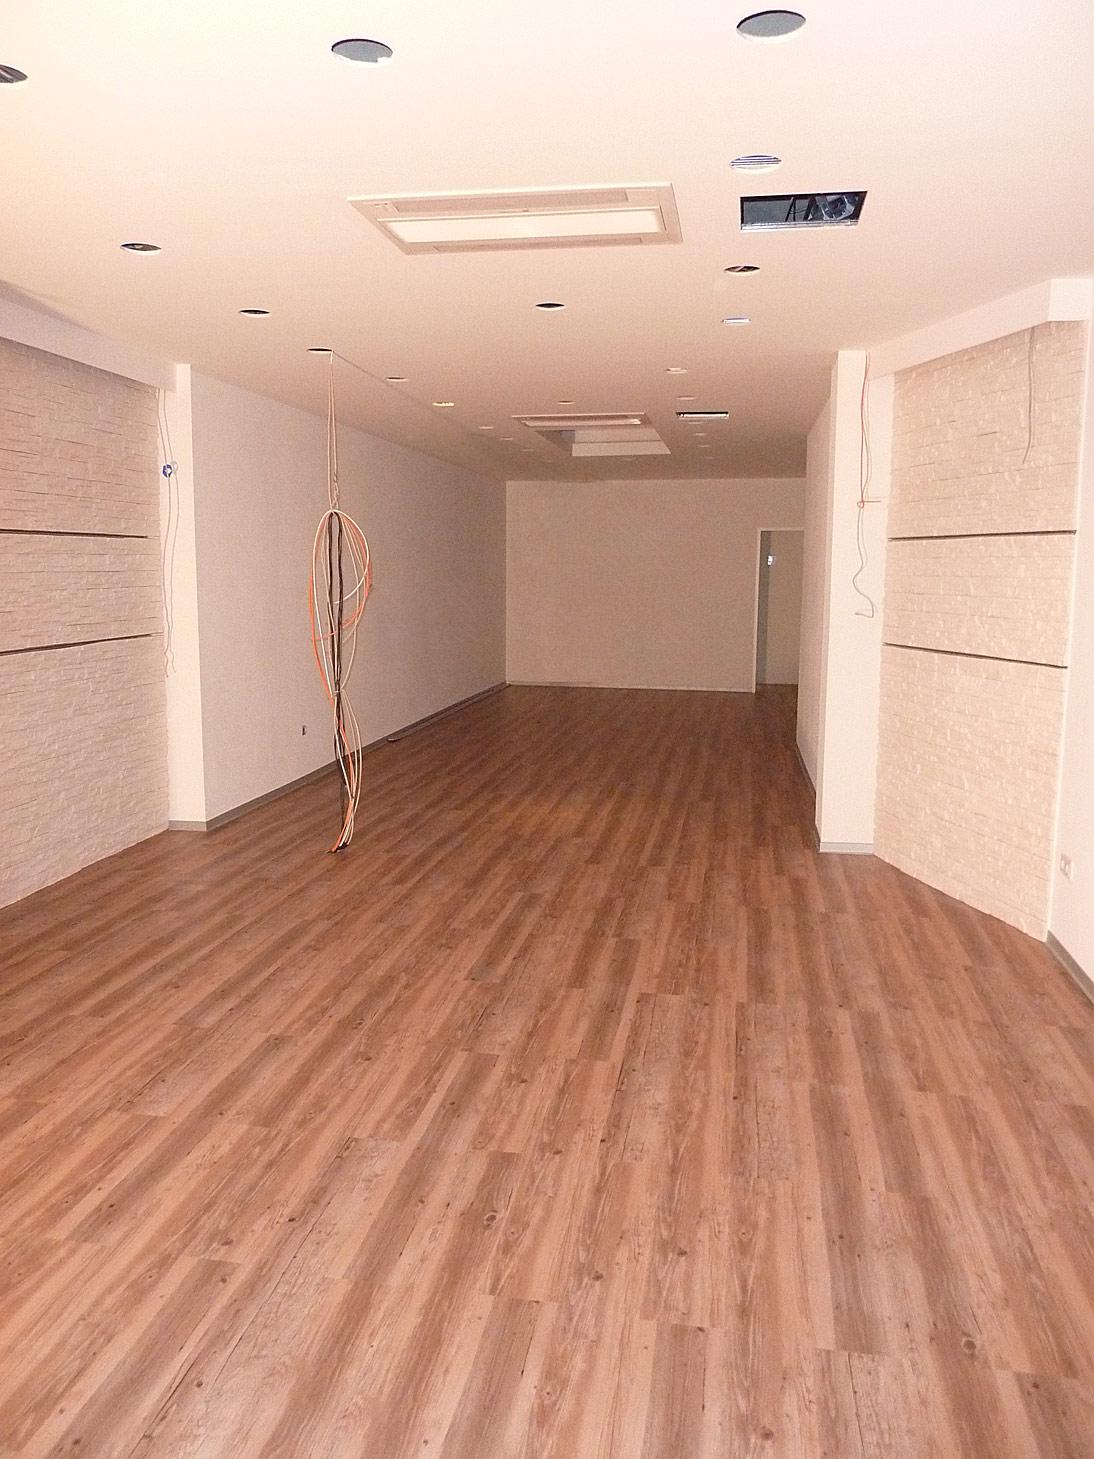 bodenbel ge laminat parkett pvc malermeister krebs lehrte. Black Bedroom Furniture Sets. Home Design Ideas